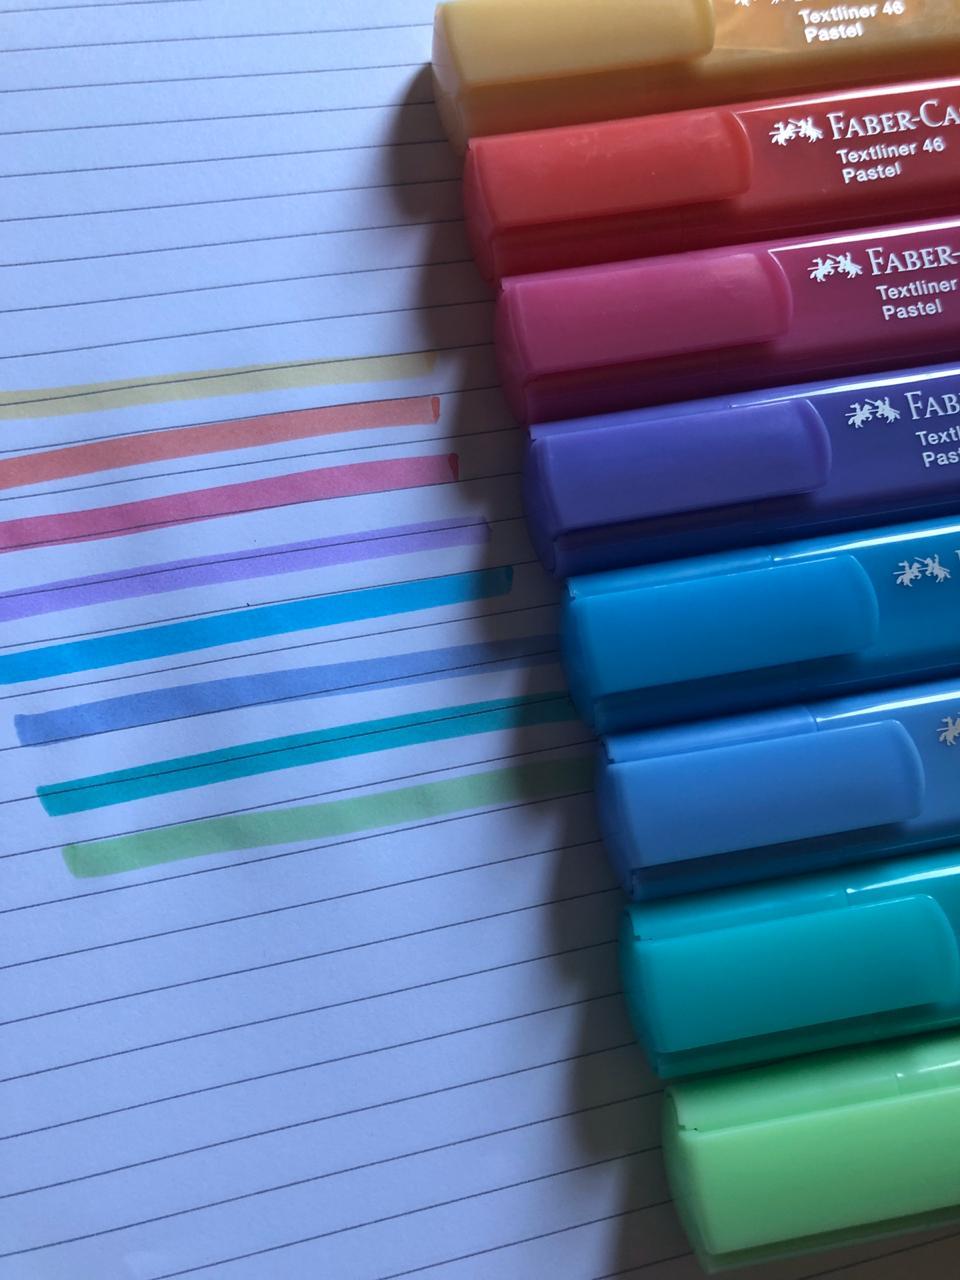 Marca texto Faber Castell Textliner - Pastel